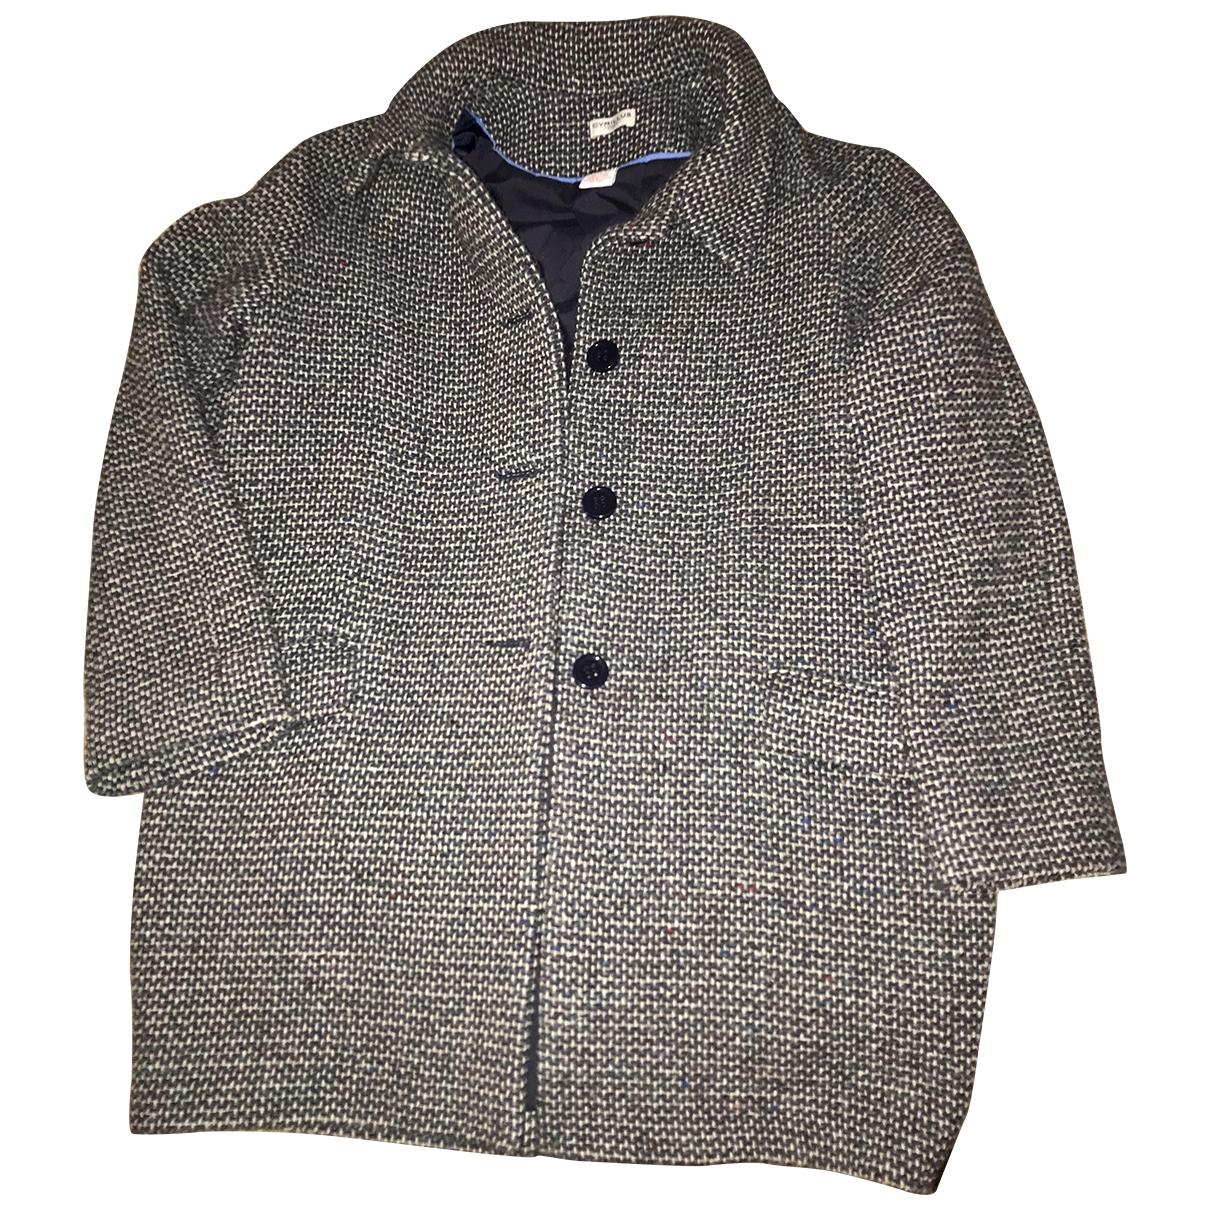 Cyrillus \N Multicolour Wool jacket & coat for Kids 14 years - S FR